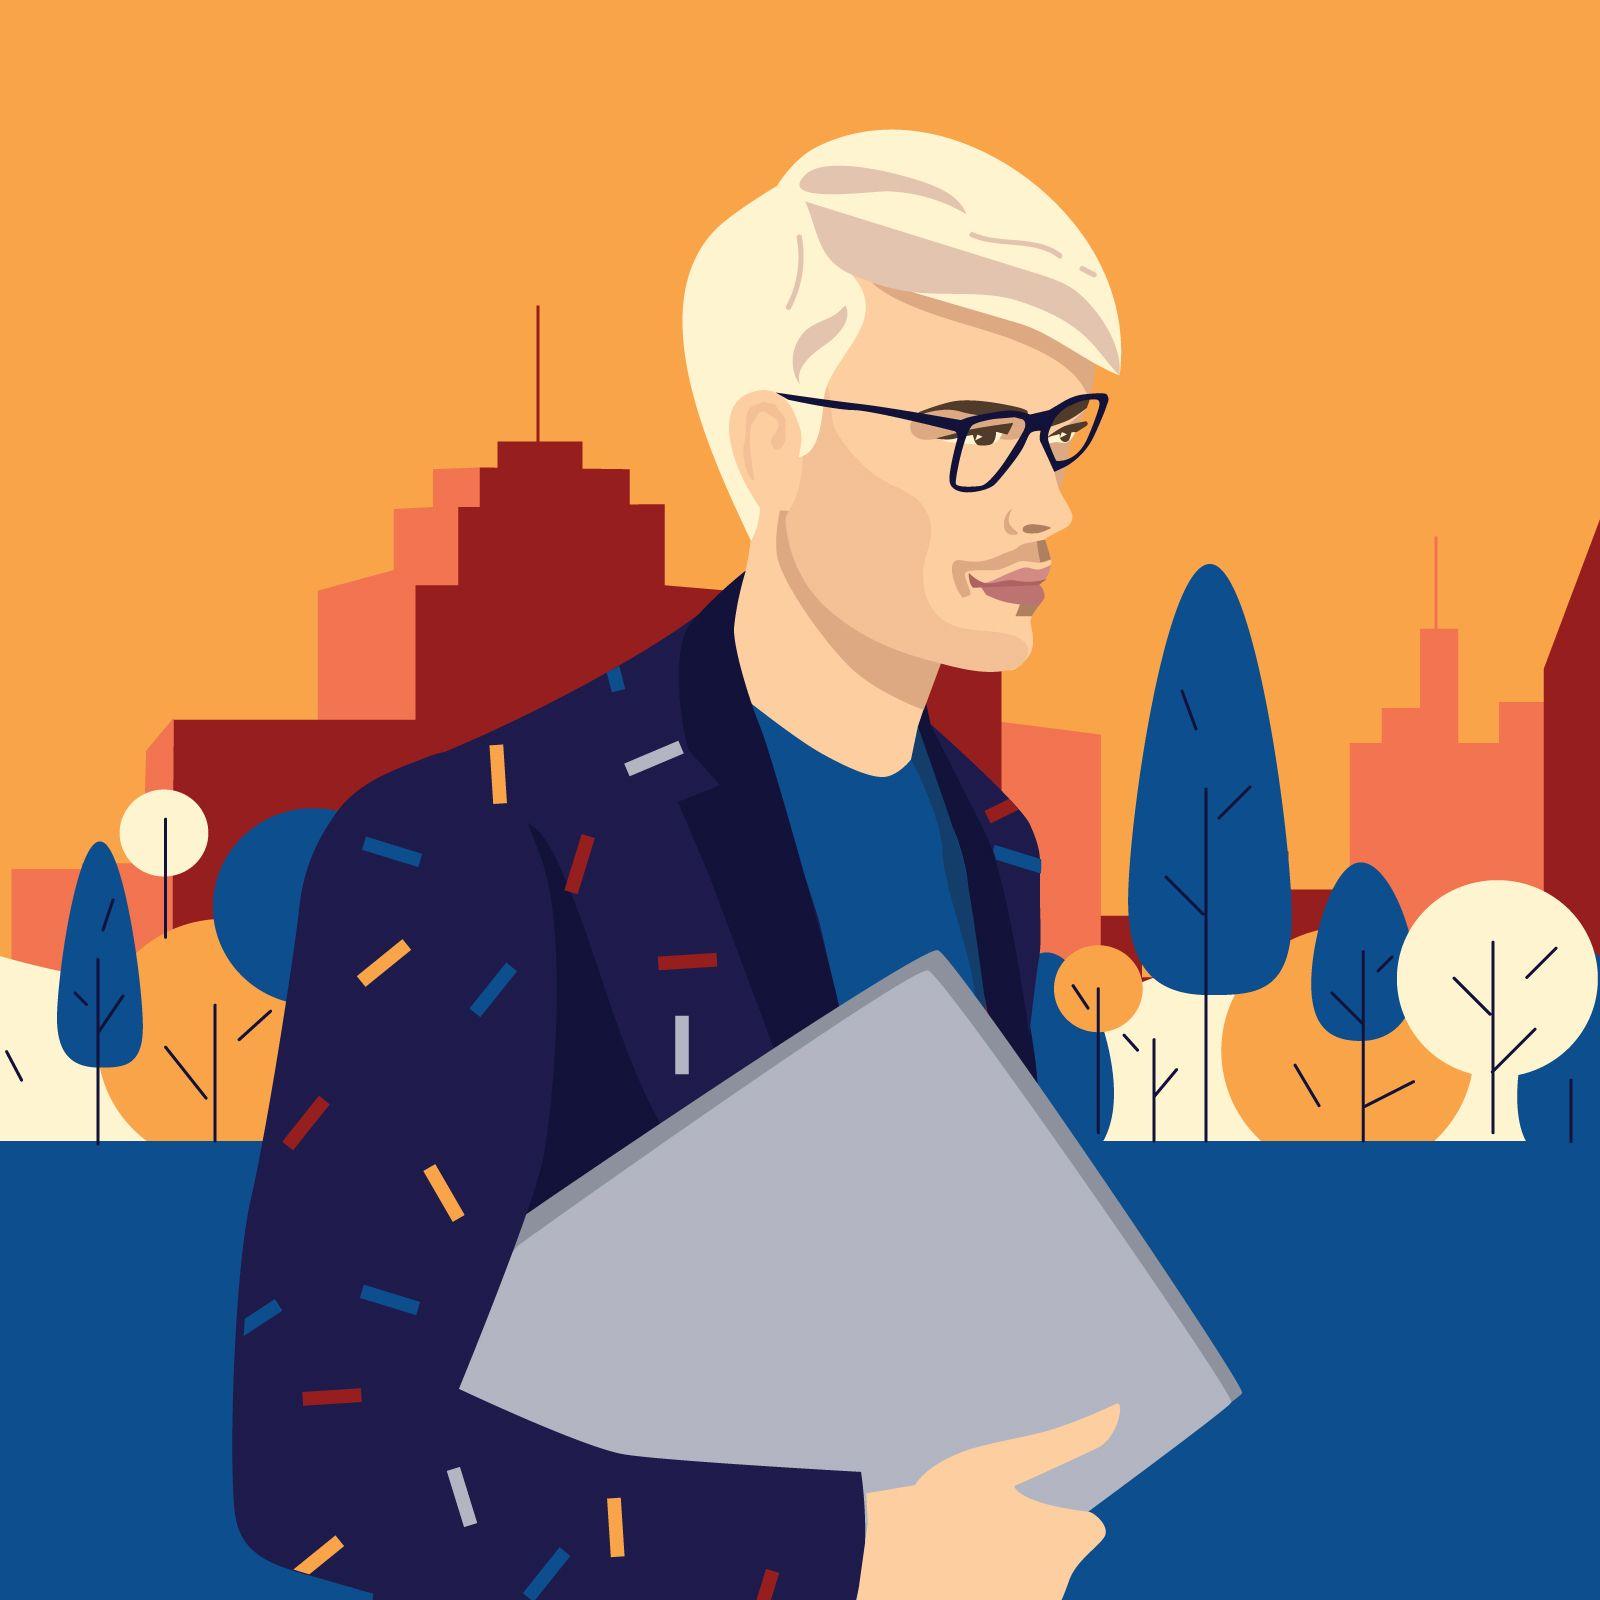 garance-illustration-Irina-Kruglova-Procter-Gamble-City-Sleek-_-Urban-Sleek